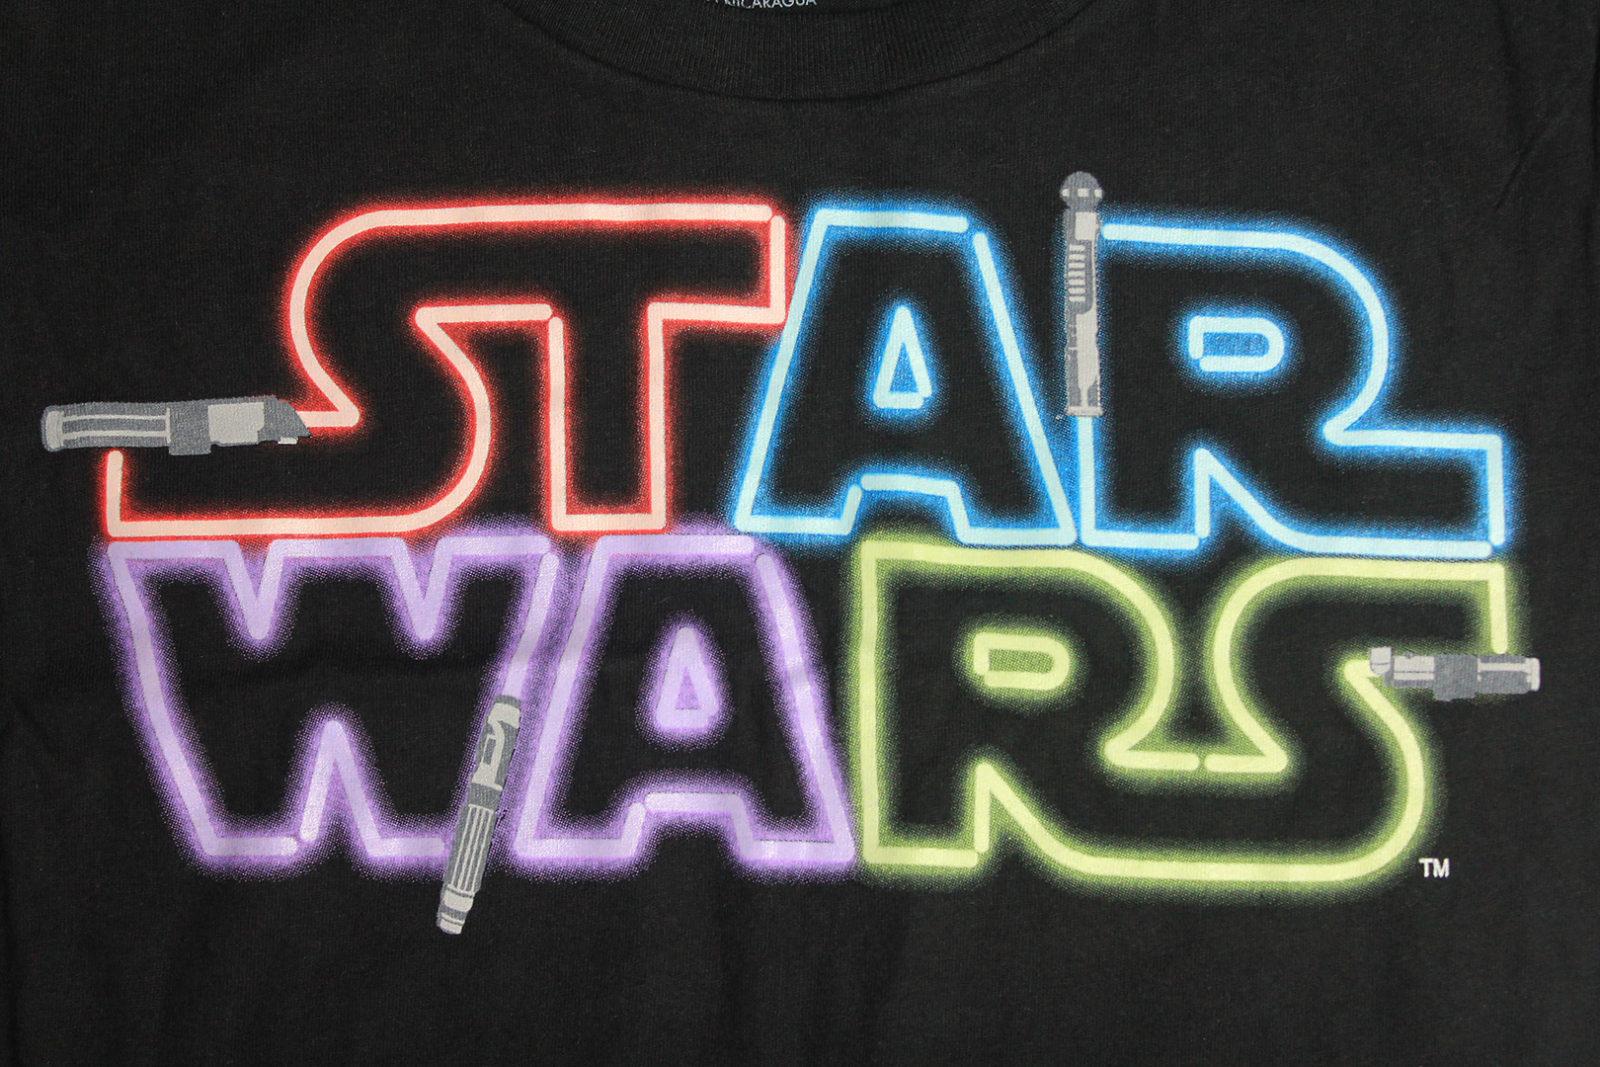 Review – Lightsaber logo tee